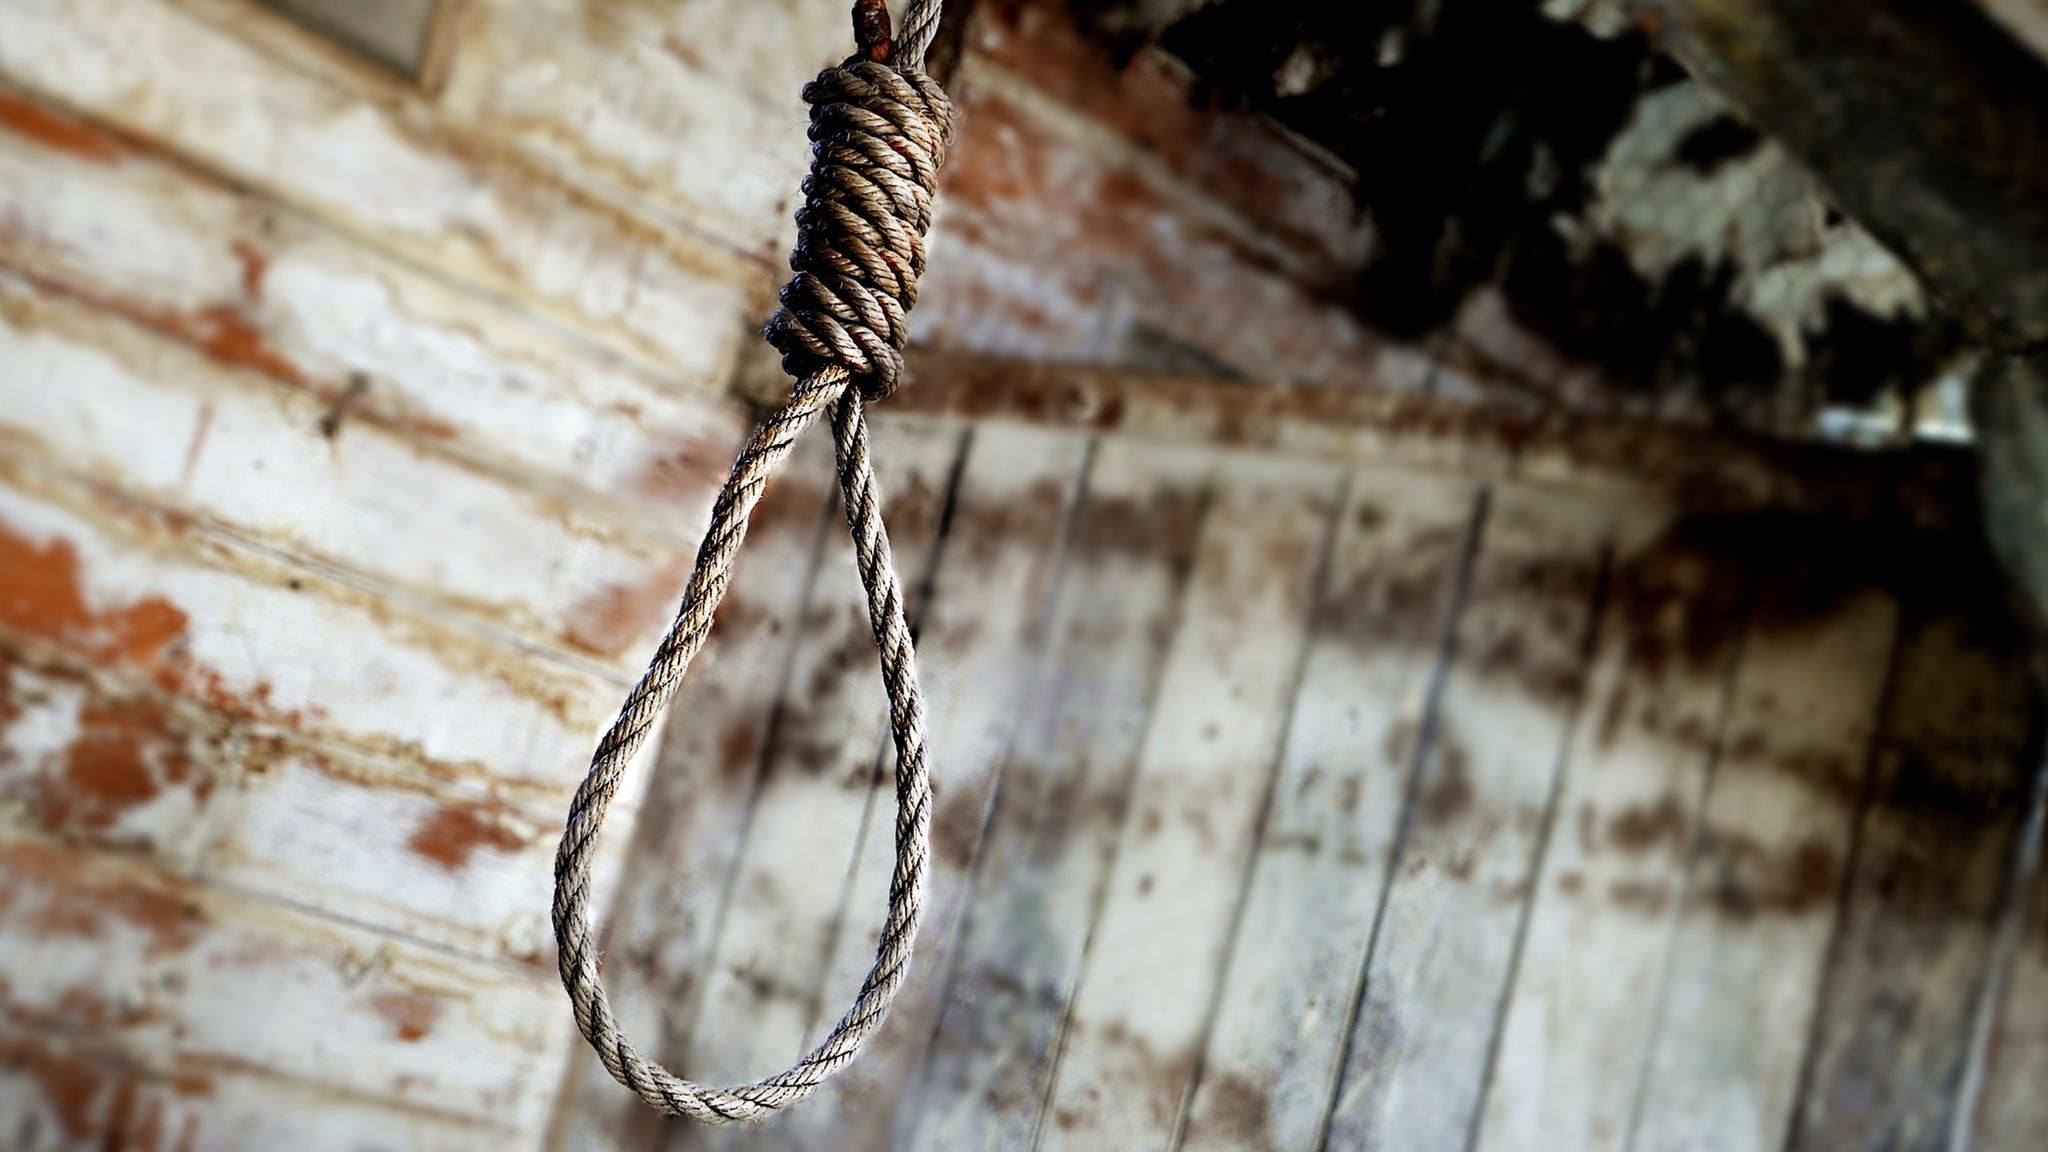 noose hanging in barn